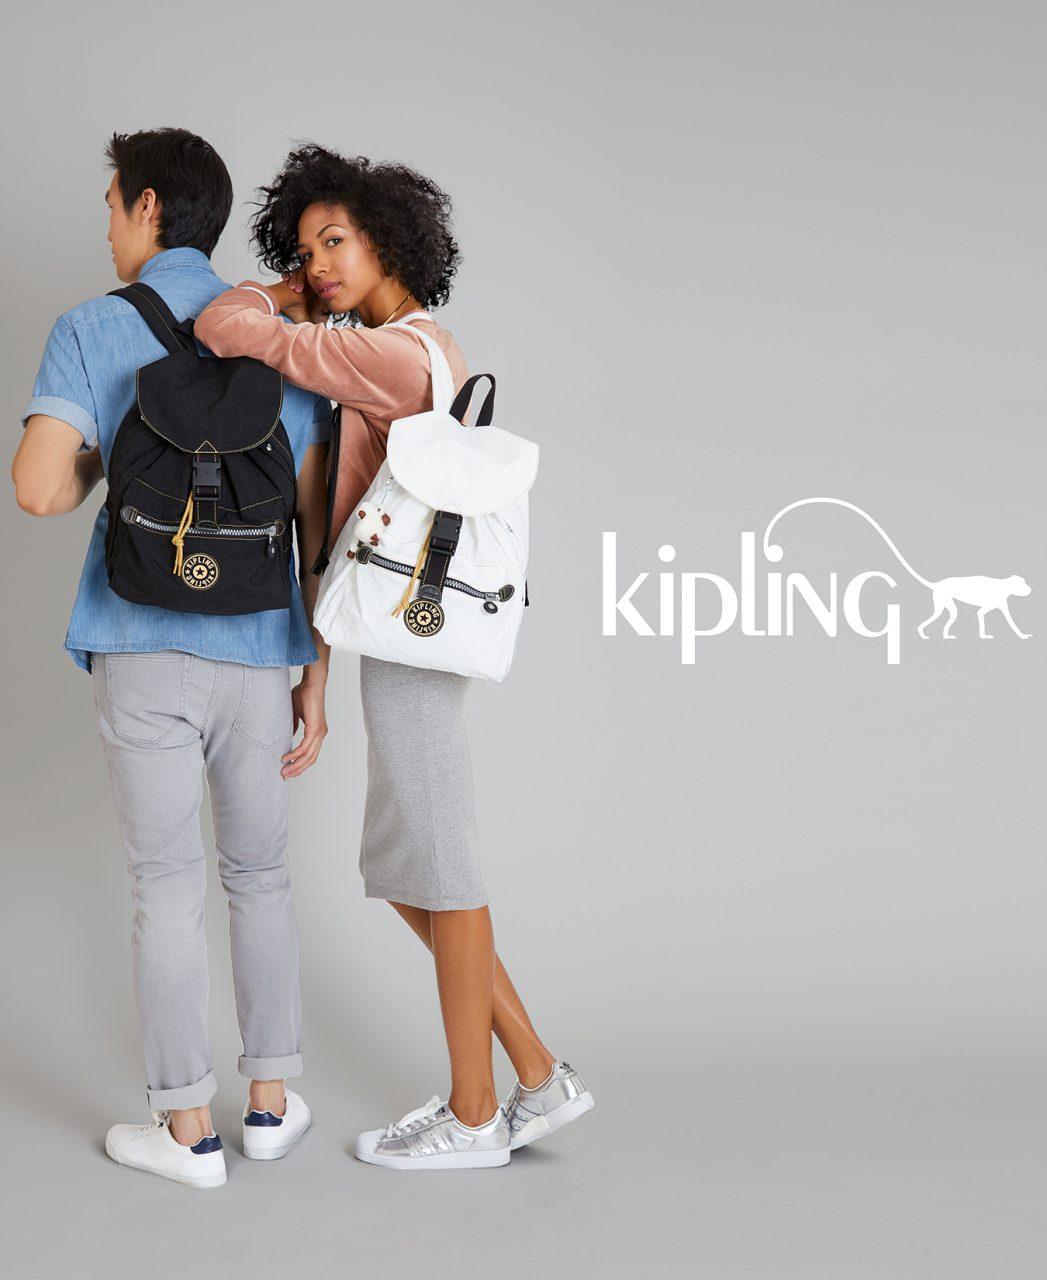 Kipling Campaign 1 web